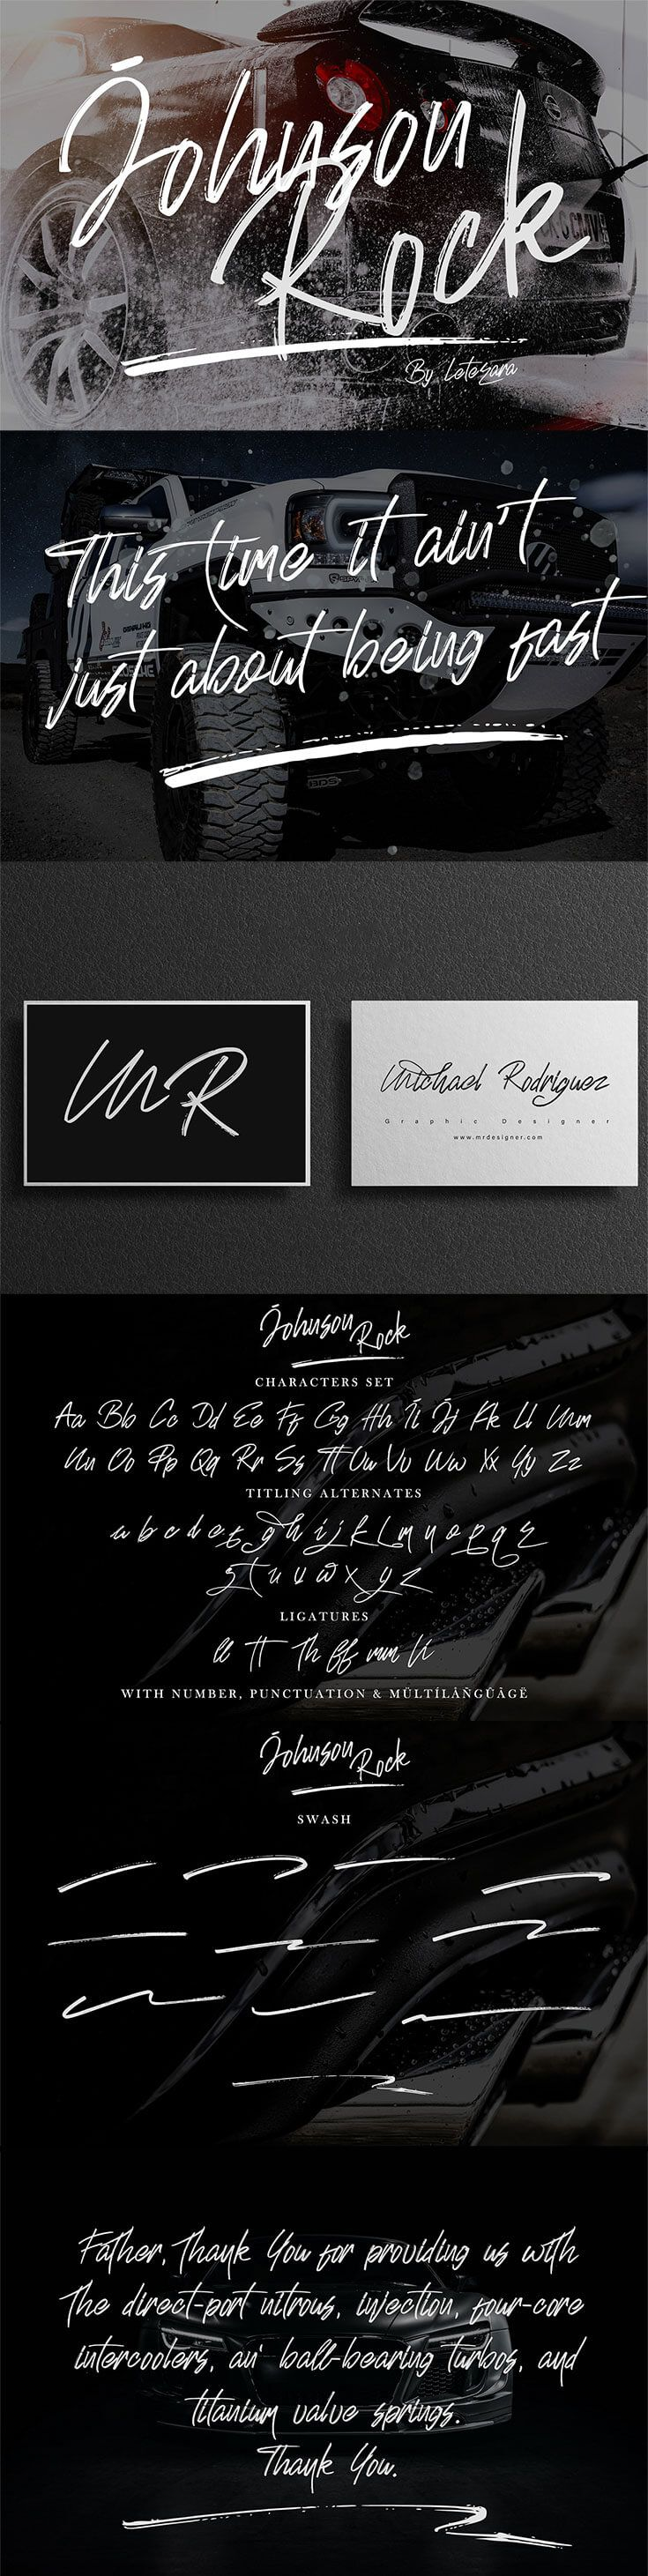 Free Johnson Rock Brush Font Brush font, Stylish text